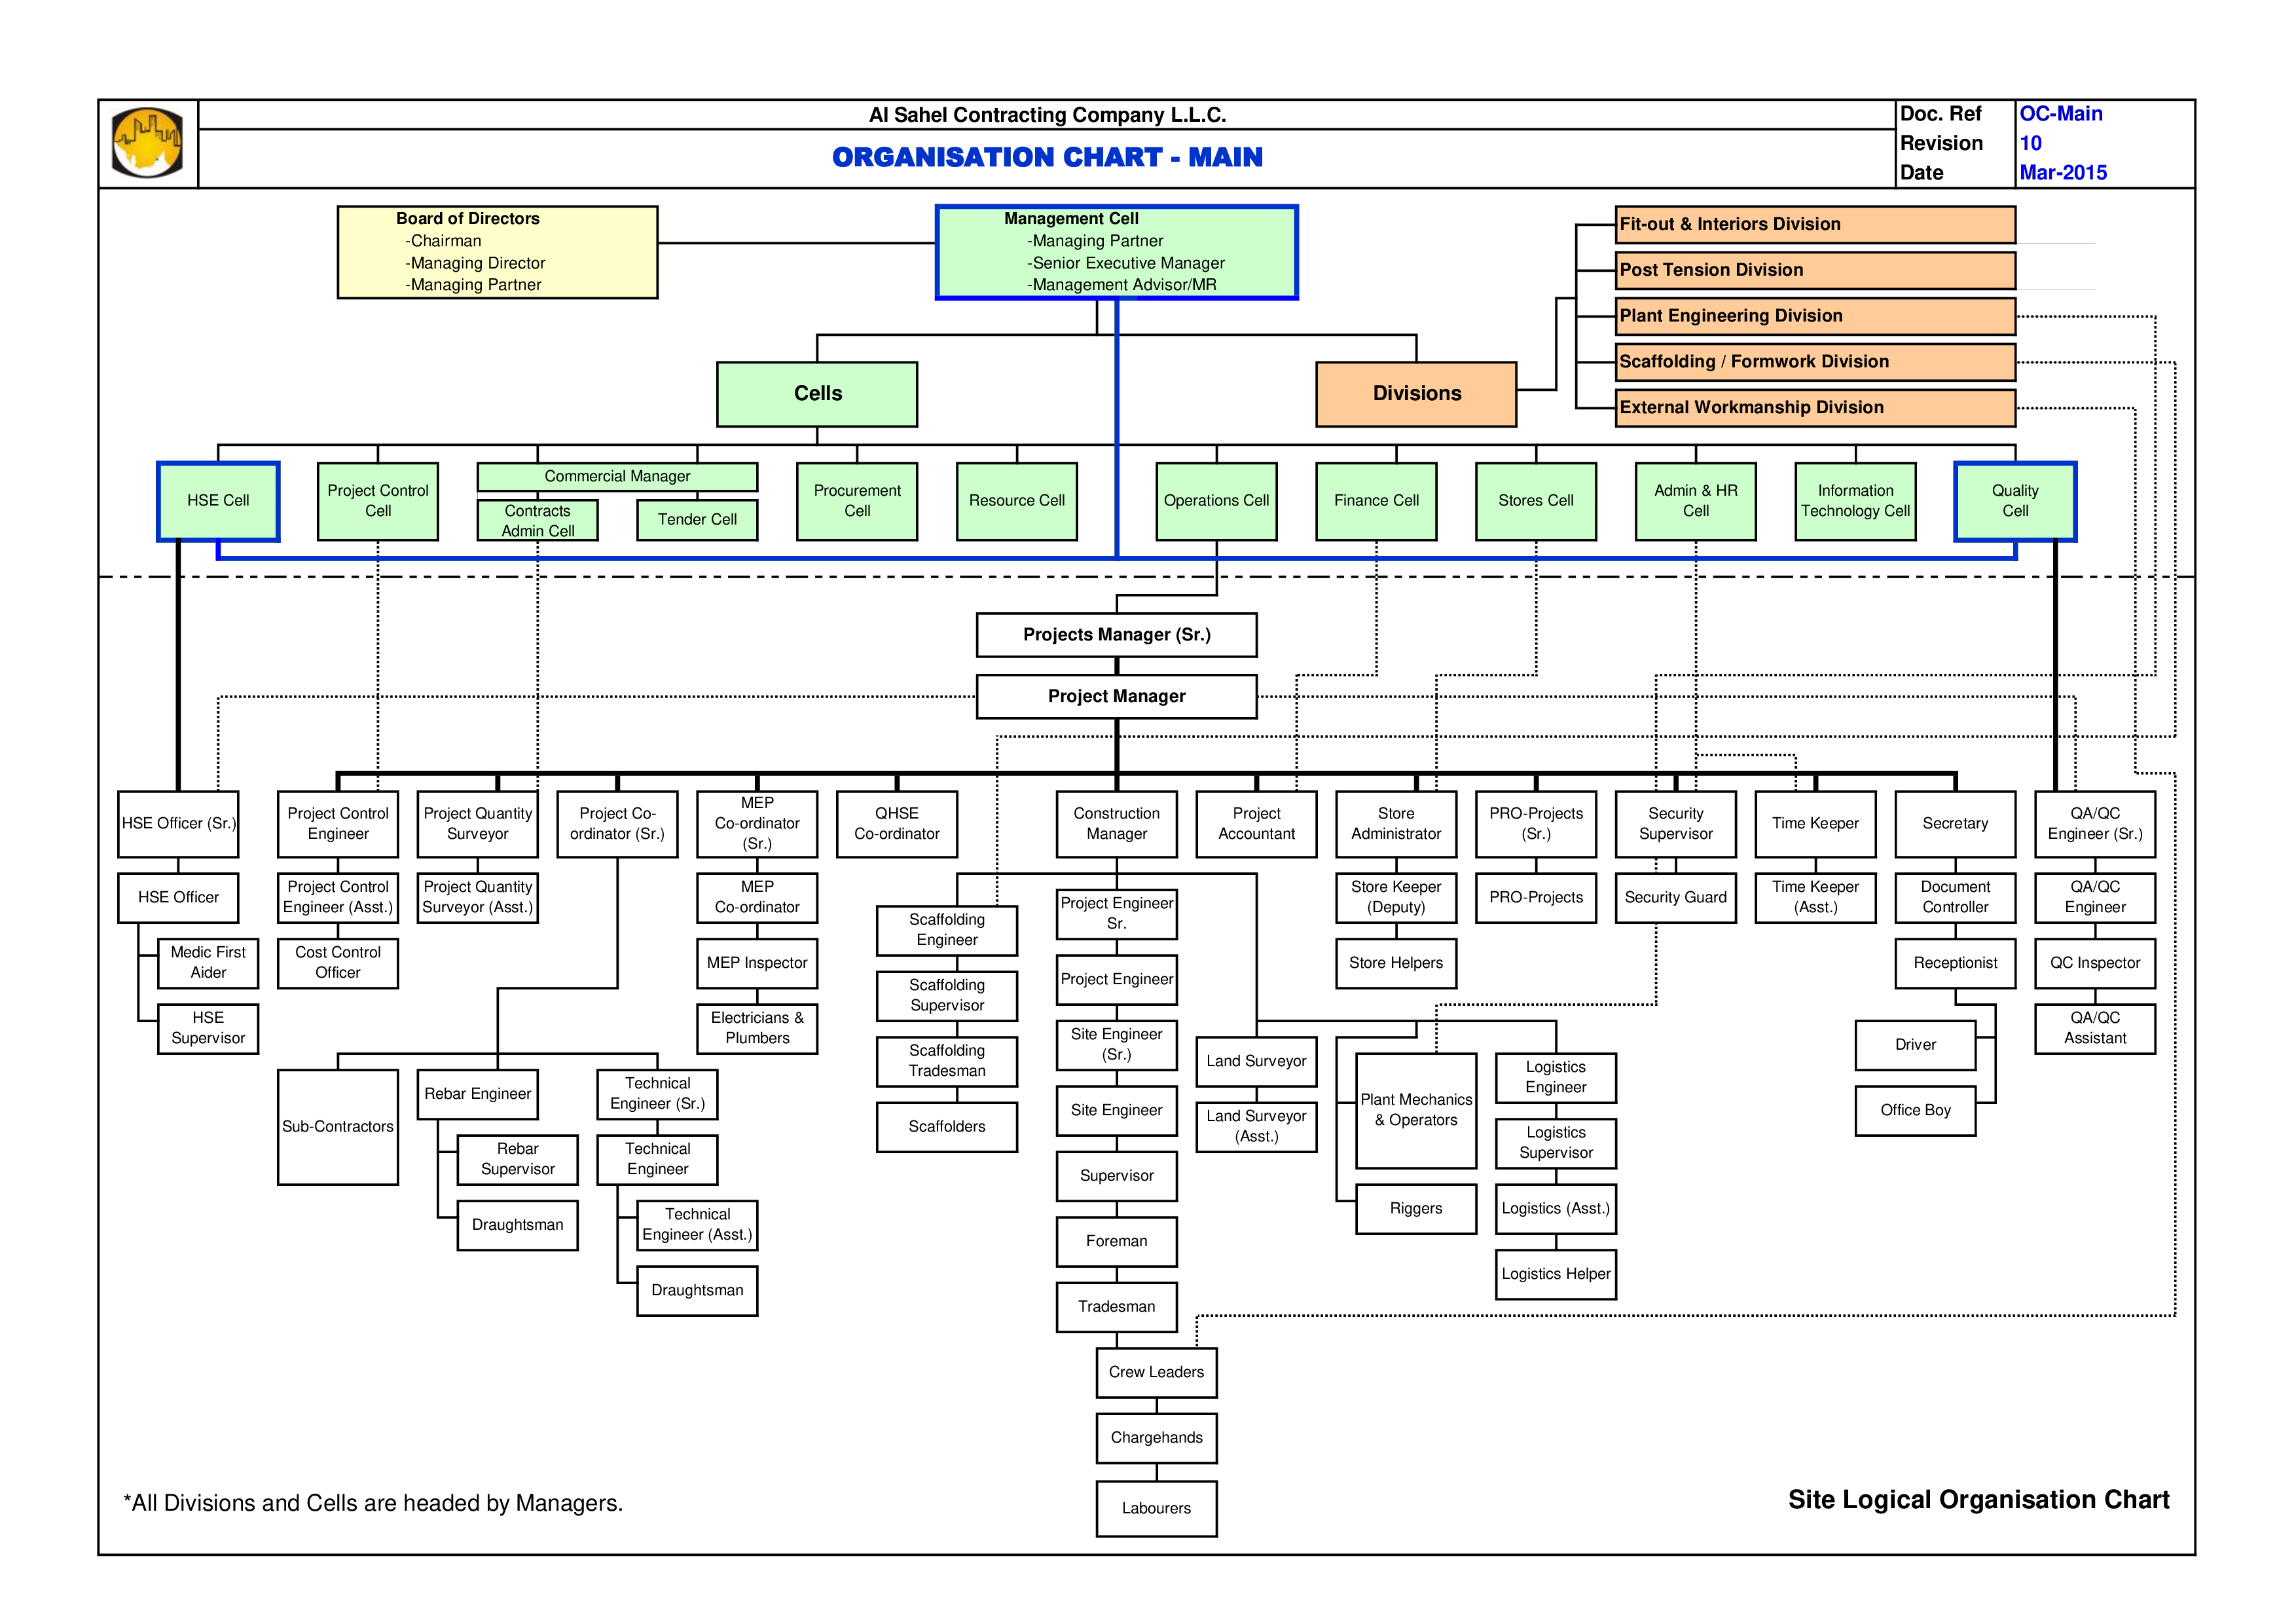 Free company organization chart templates at allbusinesstemplates company organization chart main image download template maxwellsz